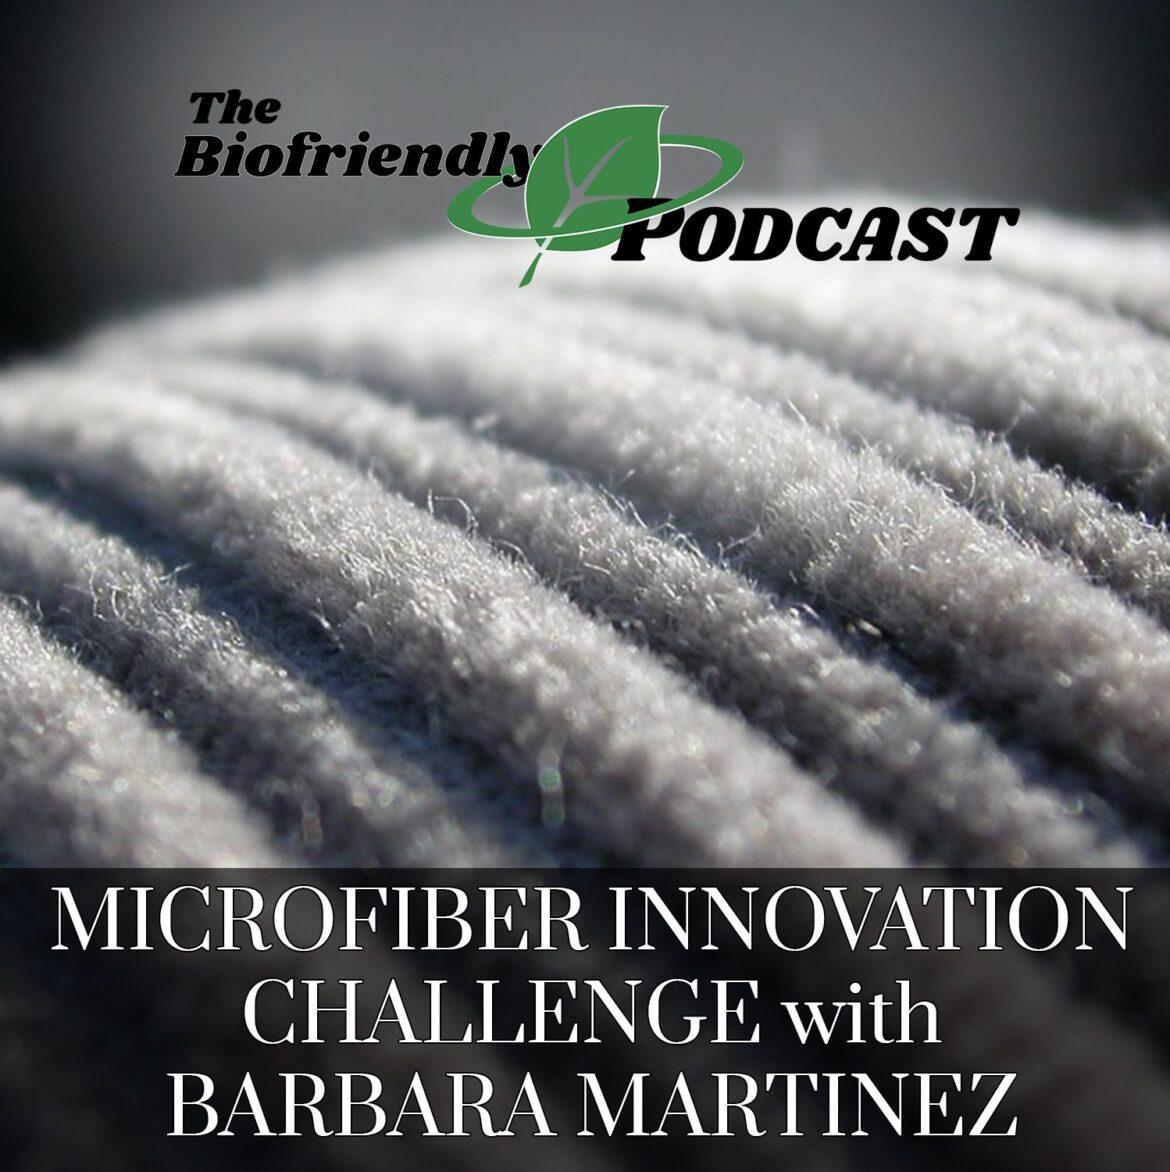 Microfiber Innovation Challenge with Barbara Martinez